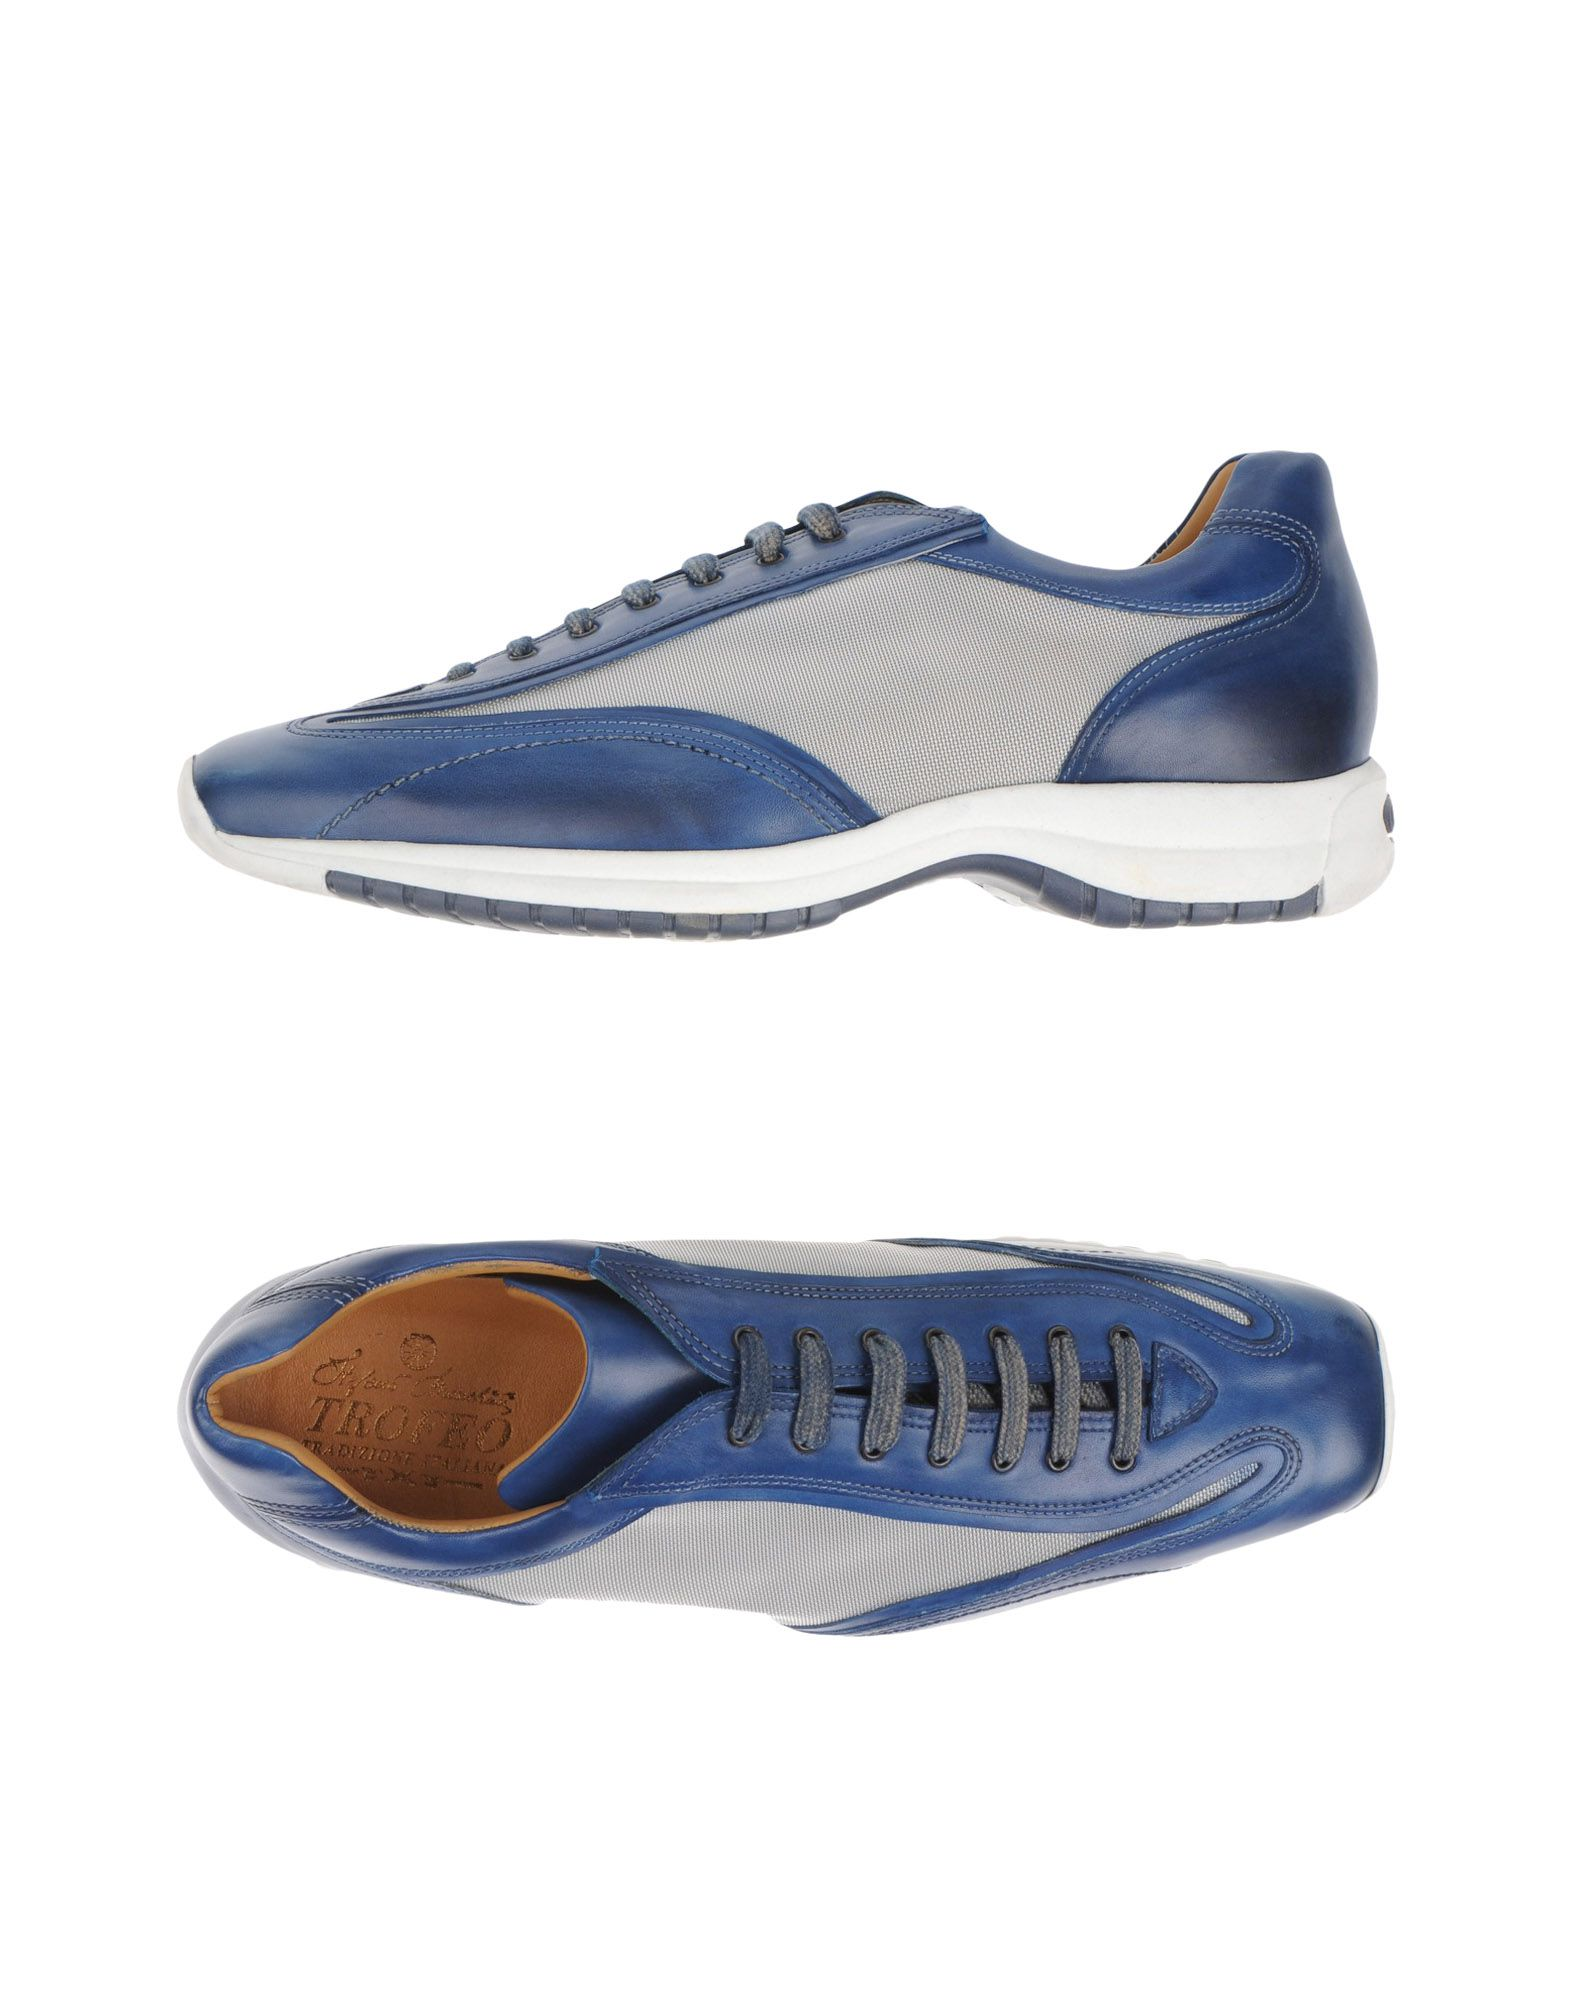 Sneakers Trofeo By Stefano Branchini Uomo - 11381812ME